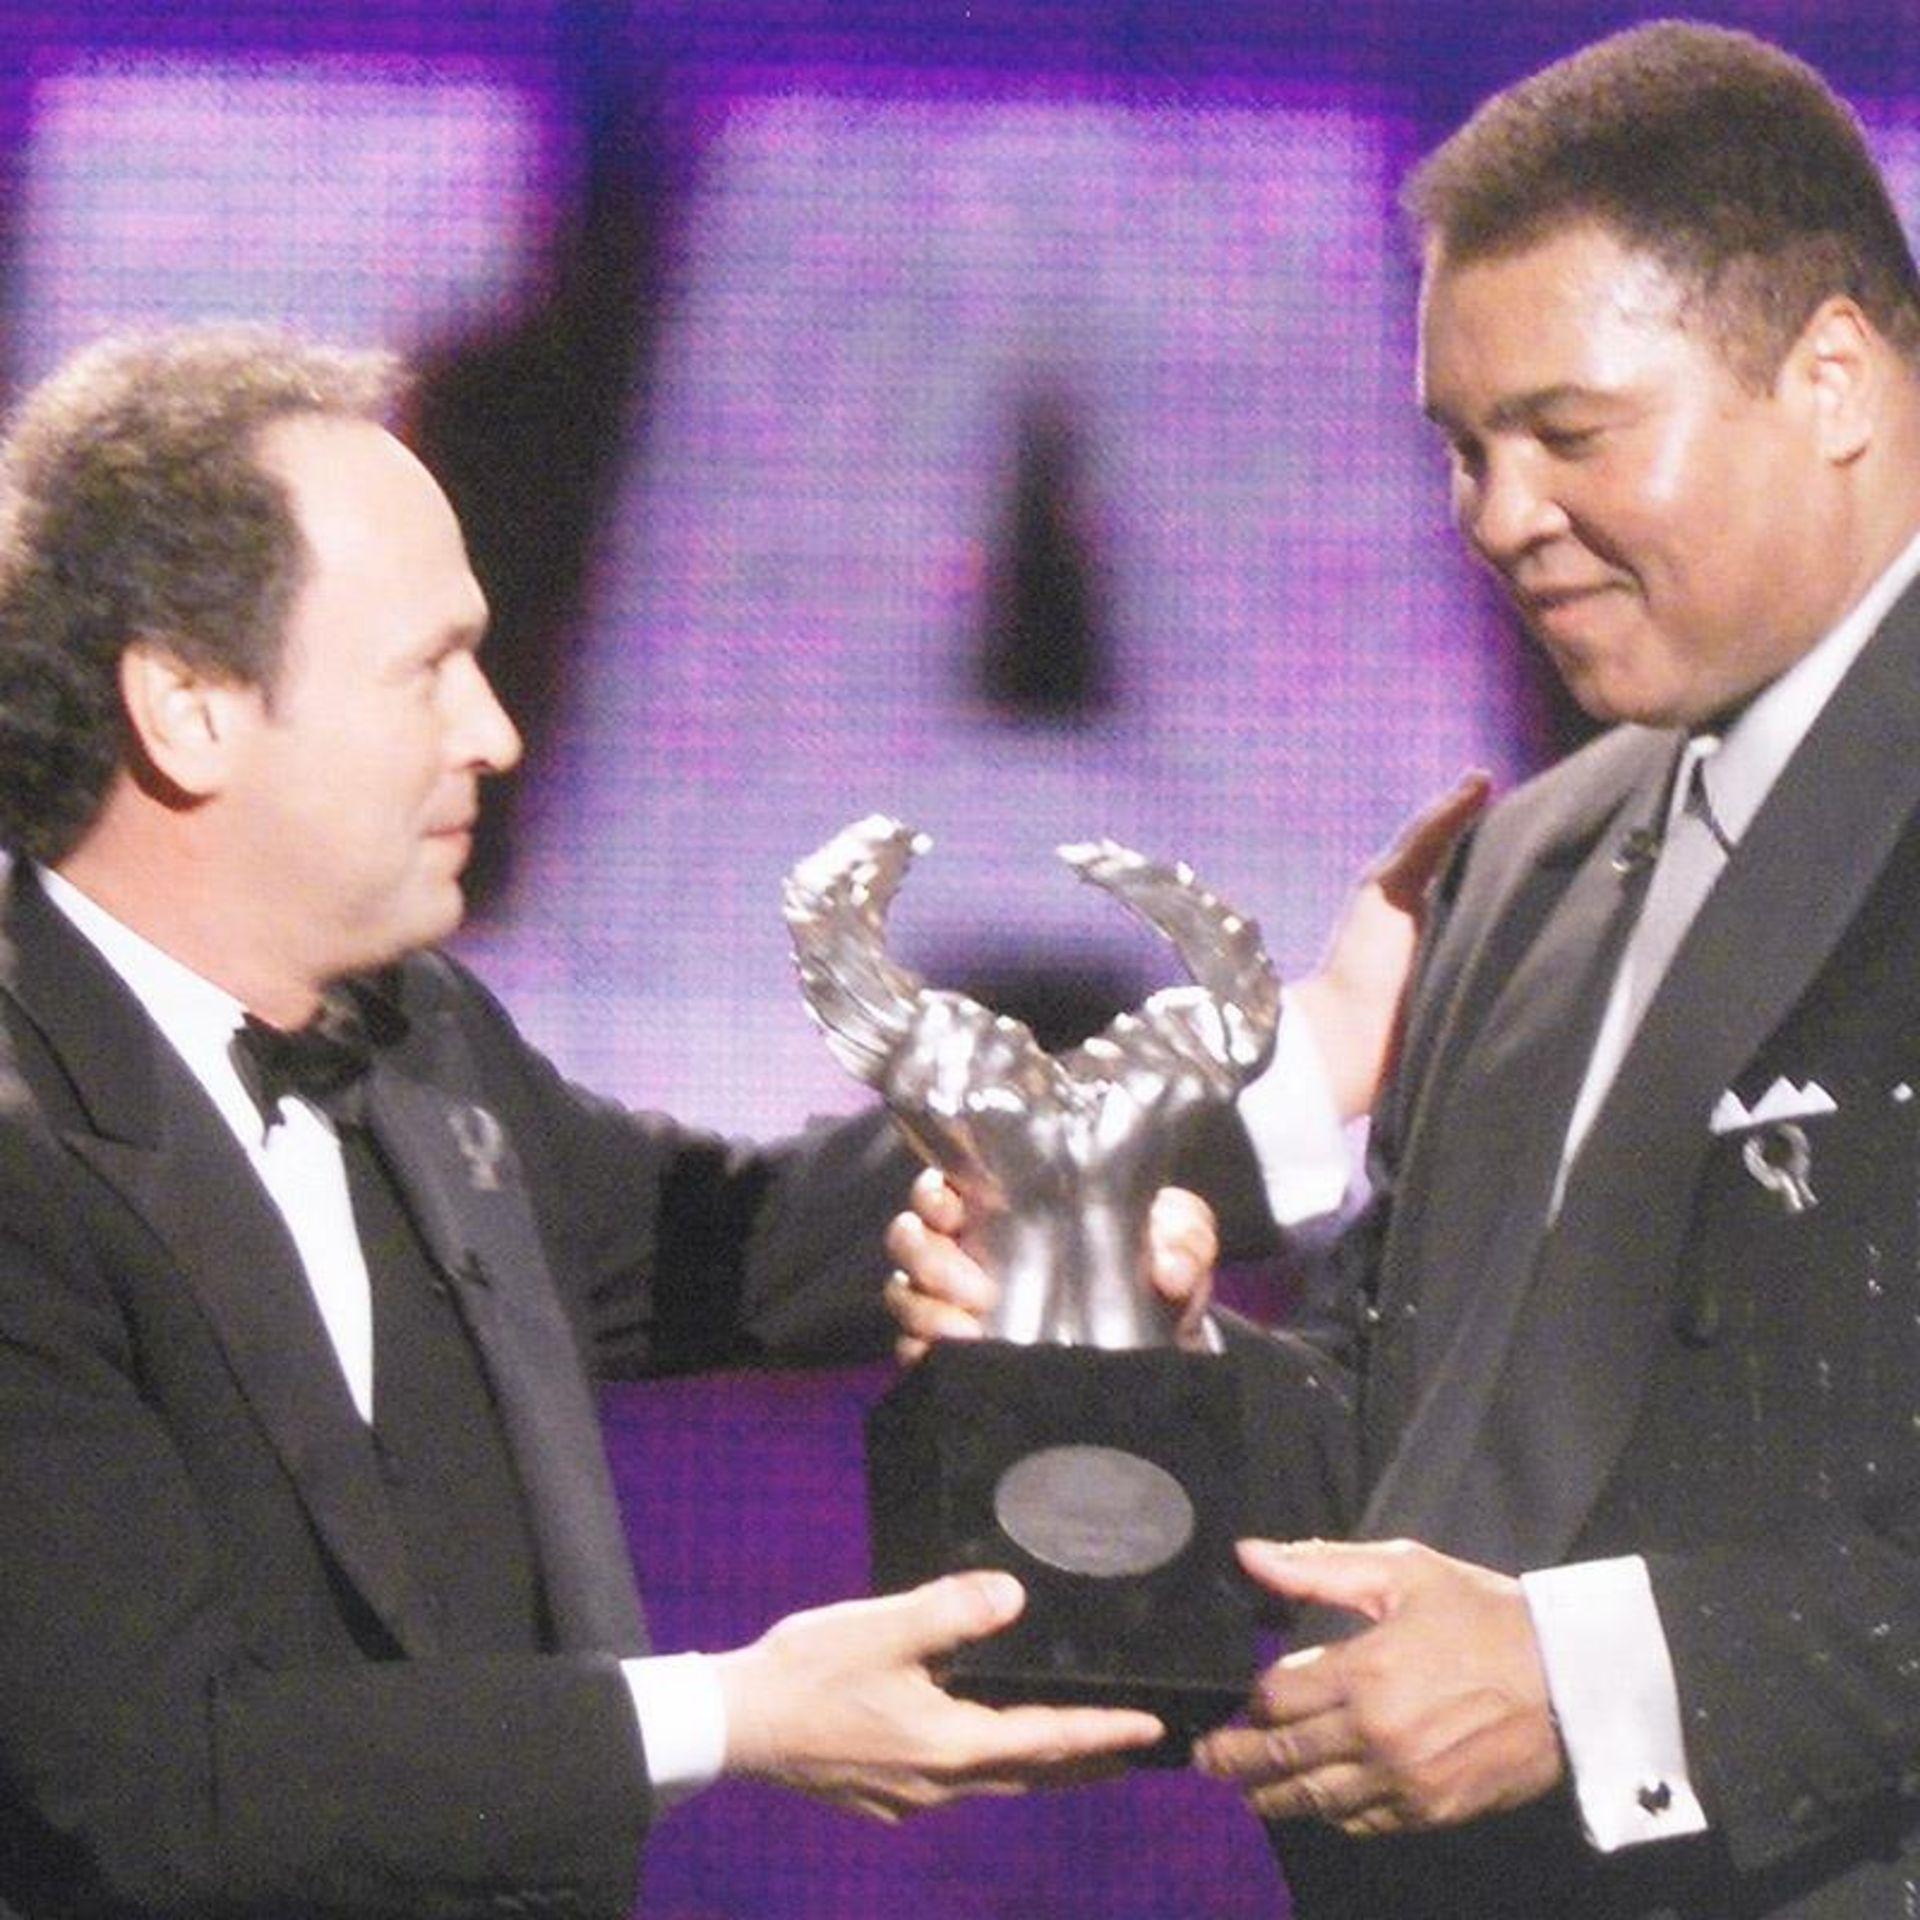 Muhammad Ali Photo by Ali, Muhammad - Image 2 of 2